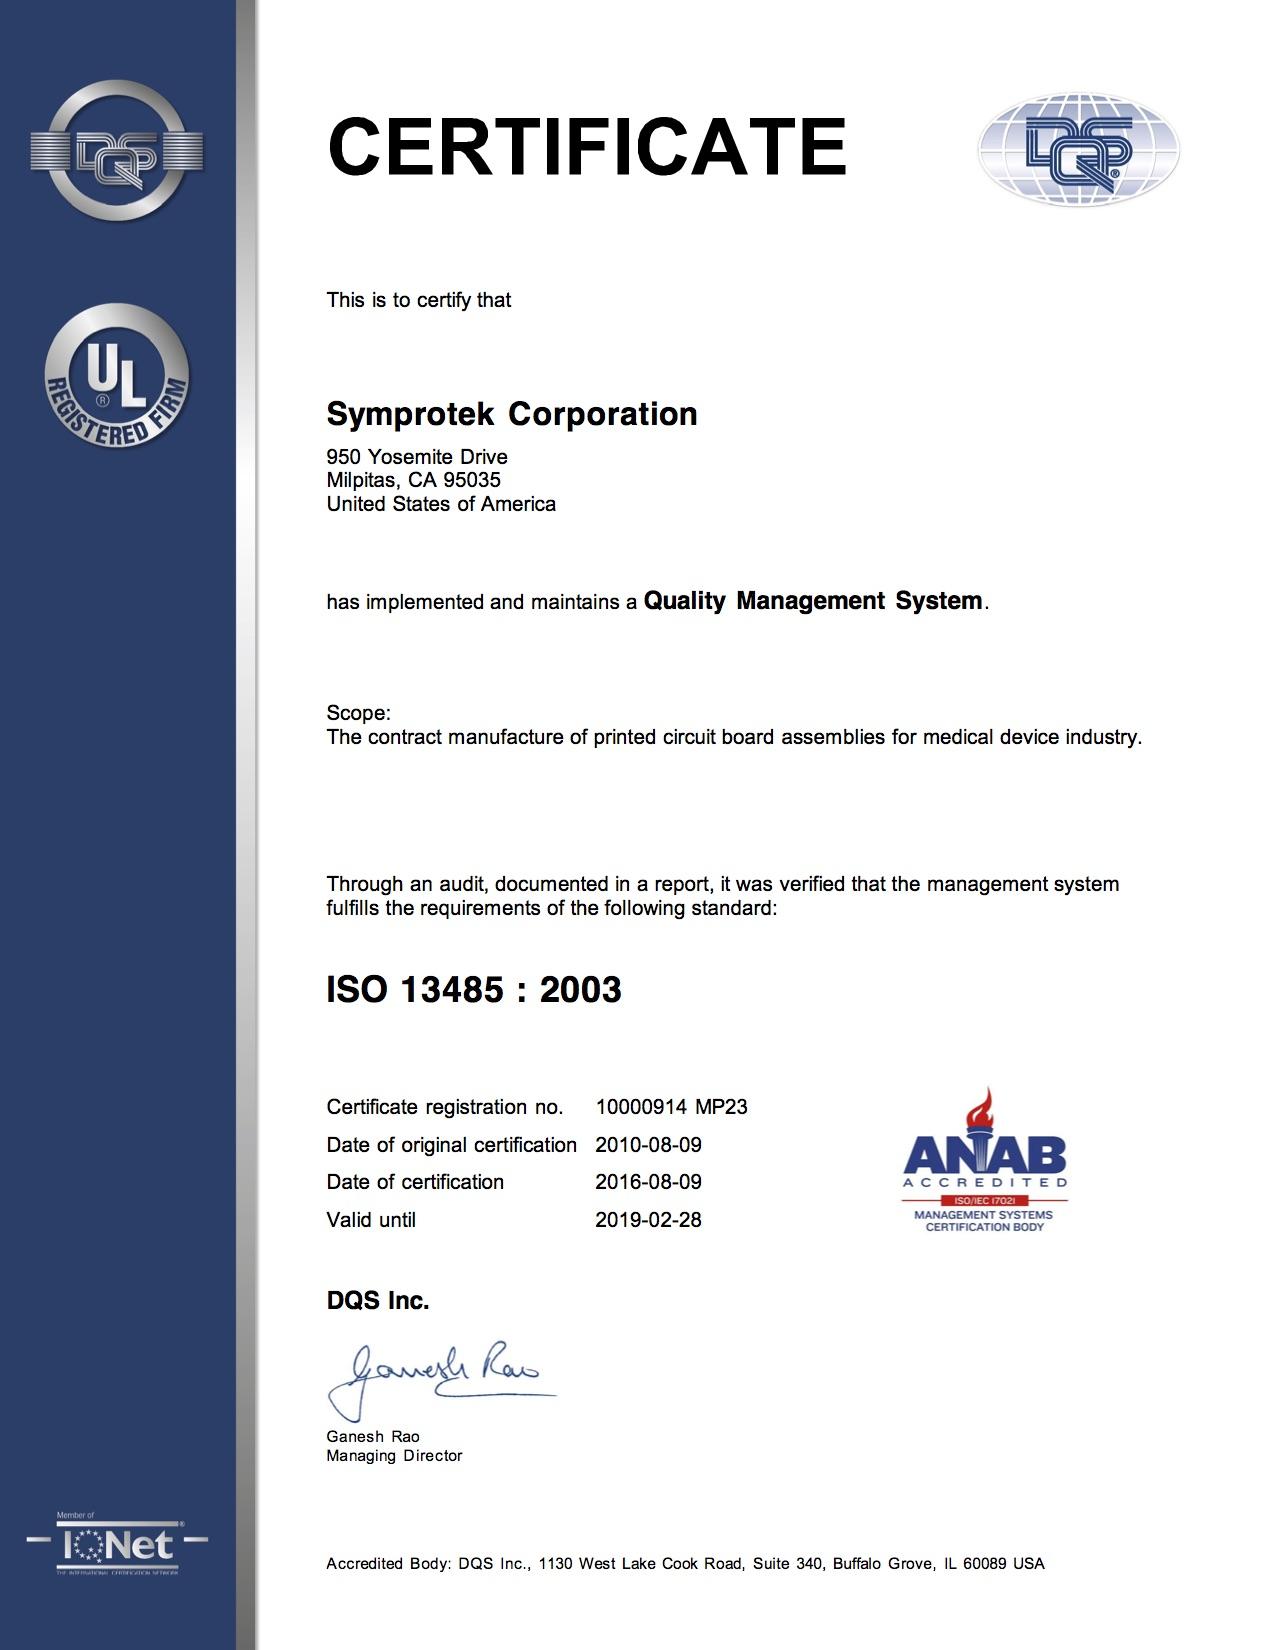 Certifications symprotek corporation turnkey pcb assembly certifications symprotek corporation turnkey pcb assembly supply chain xflitez Gallery